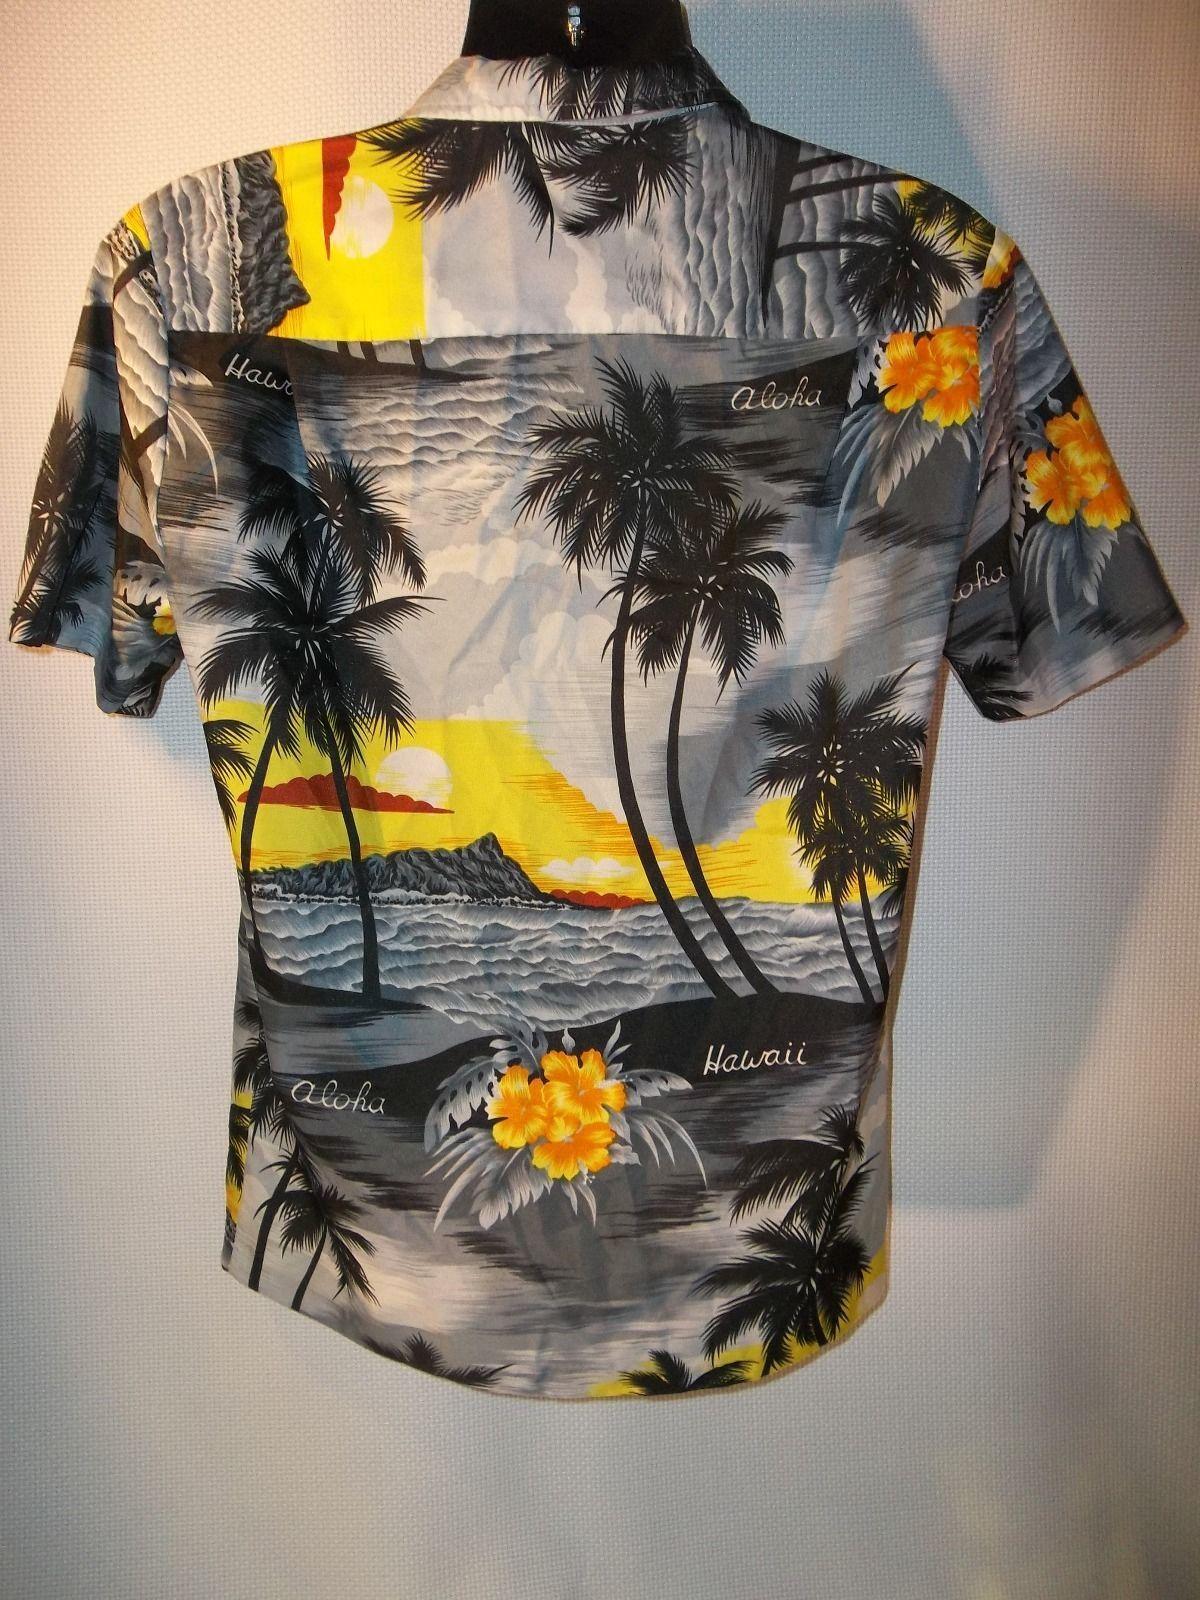 Hawaiian,Tropical, Button Front, Shirt by Royal Creations, Hawaii, Size S